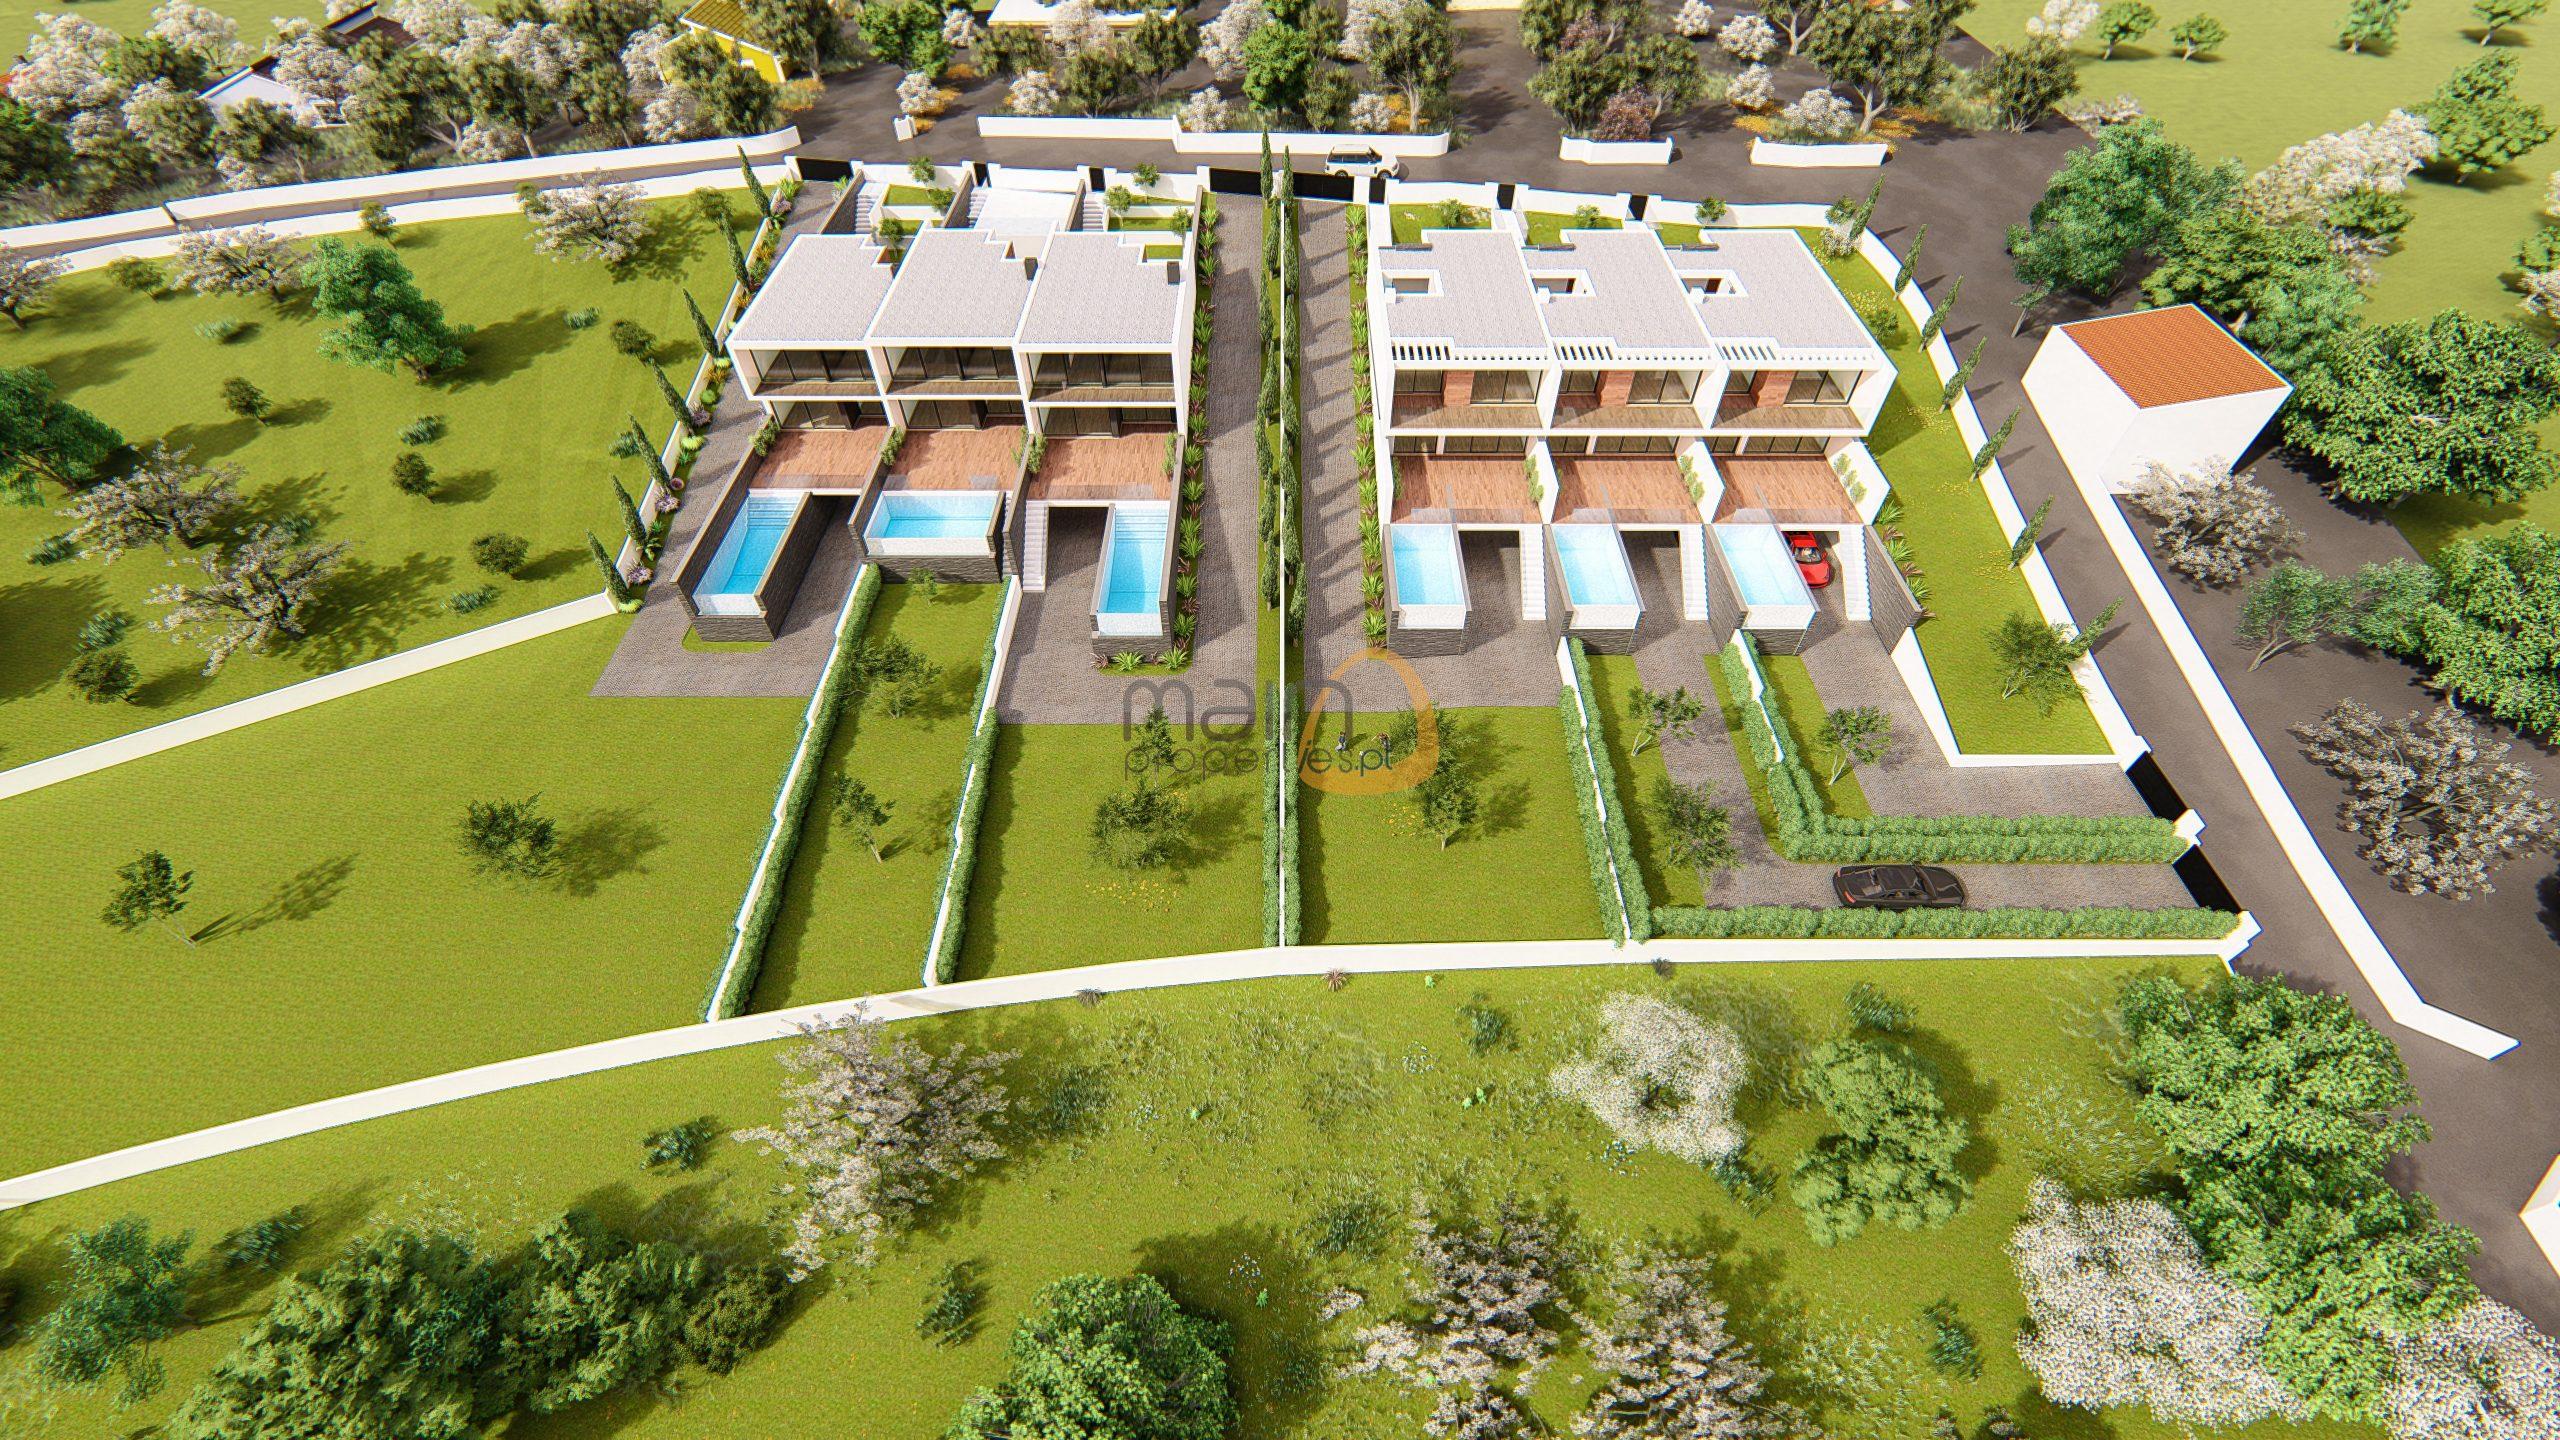 land-for-development-of-eleven-villas-with-sea-views-in-almancil-algarve-portugal-property-real-estate-07